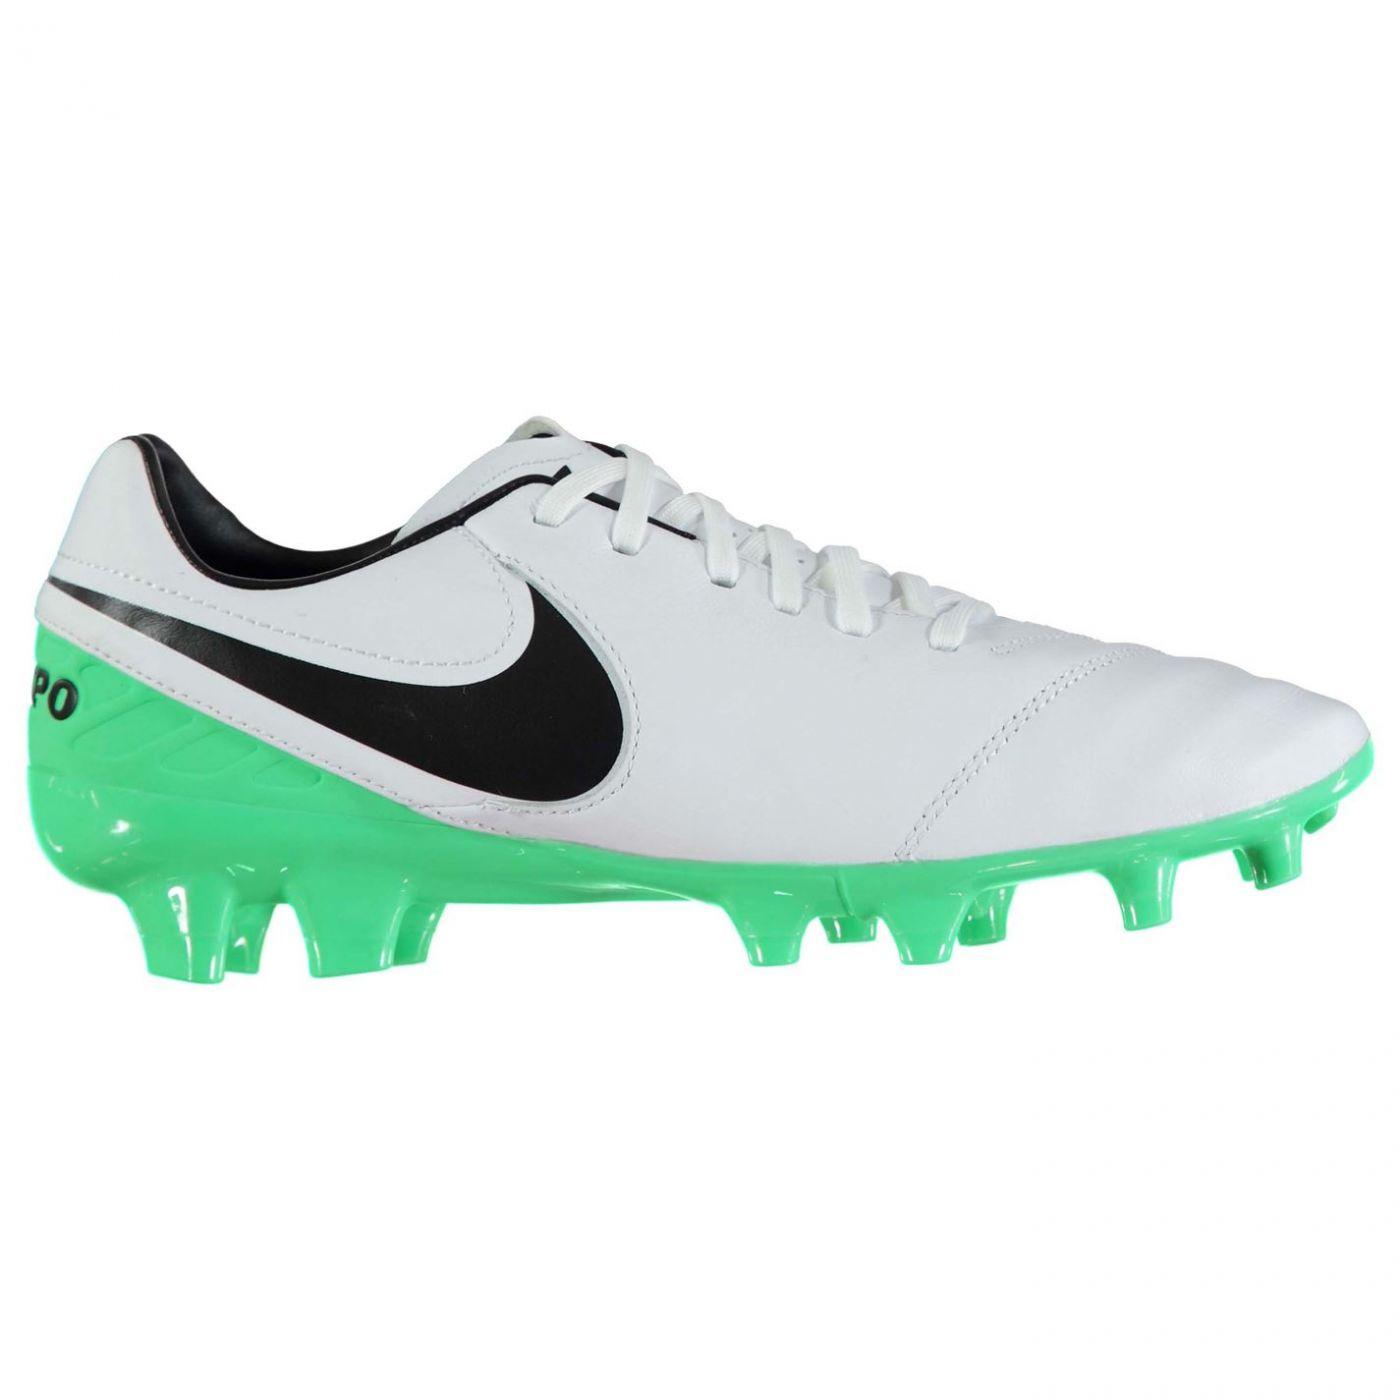 dd5d4b244a08 Nike Tiempo Mystic FG Mens Football Boots - FACTCOOL